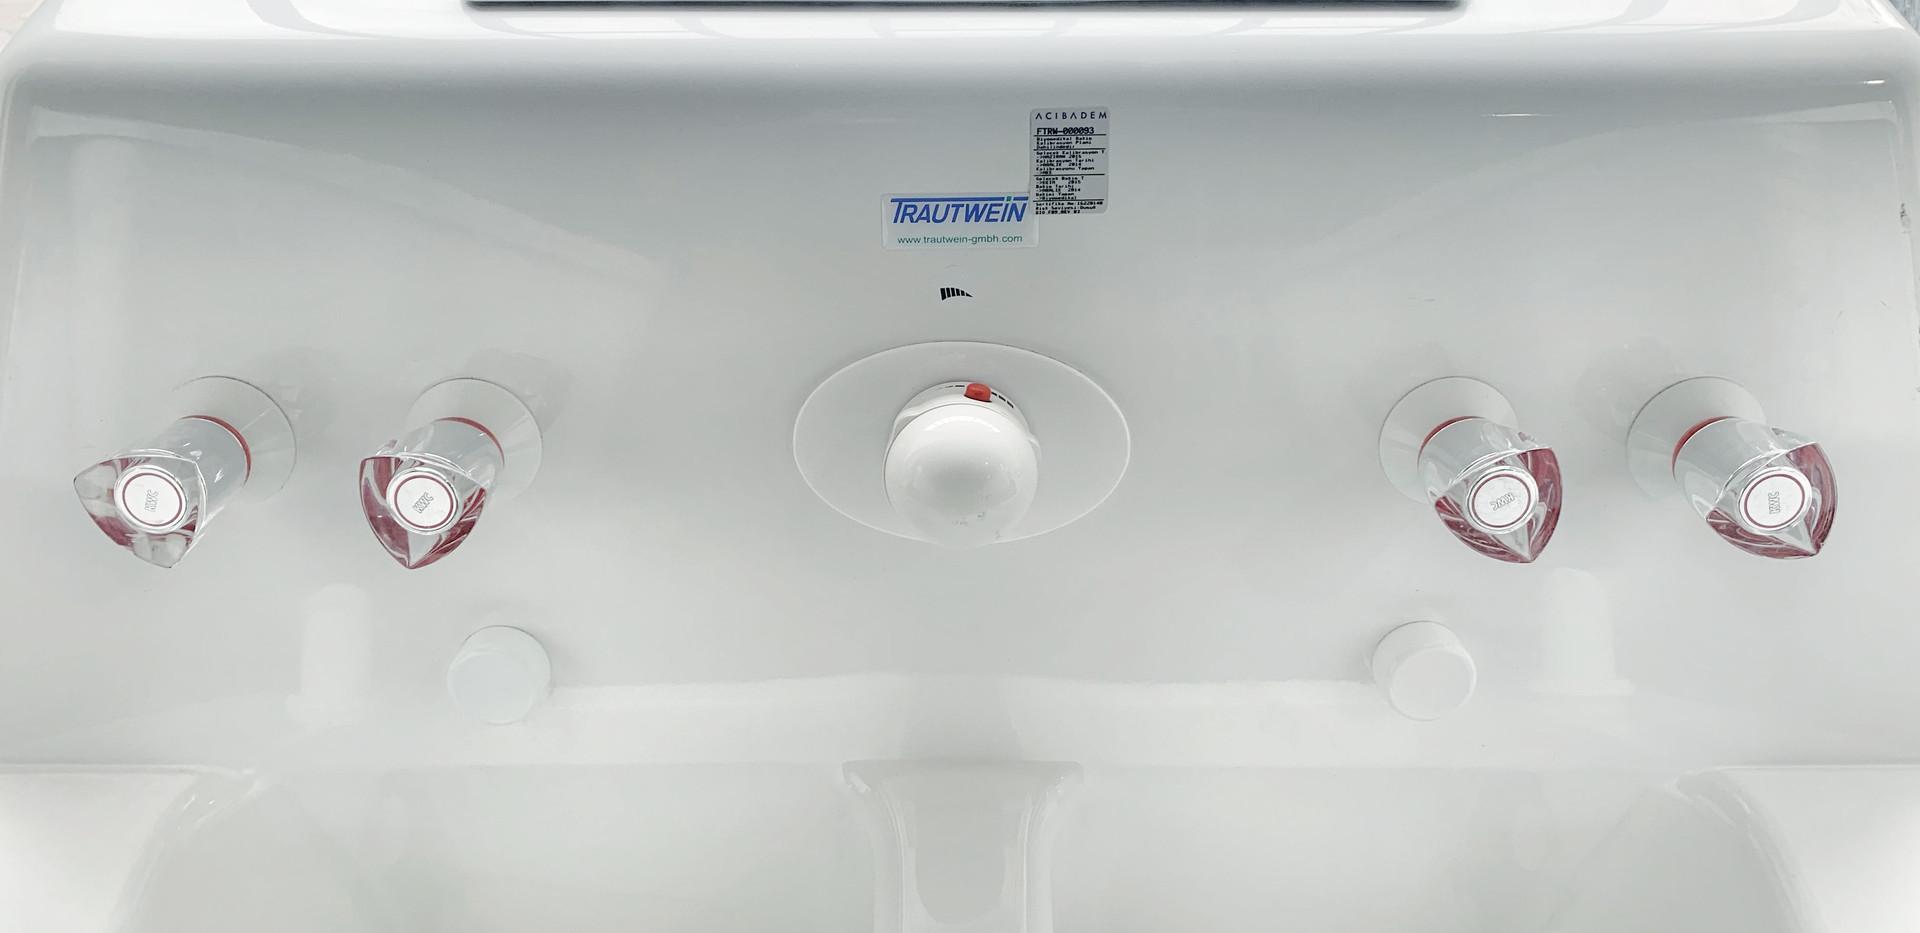 Trautwein GI-VZ 4 Hücreli Galvanik Banyo